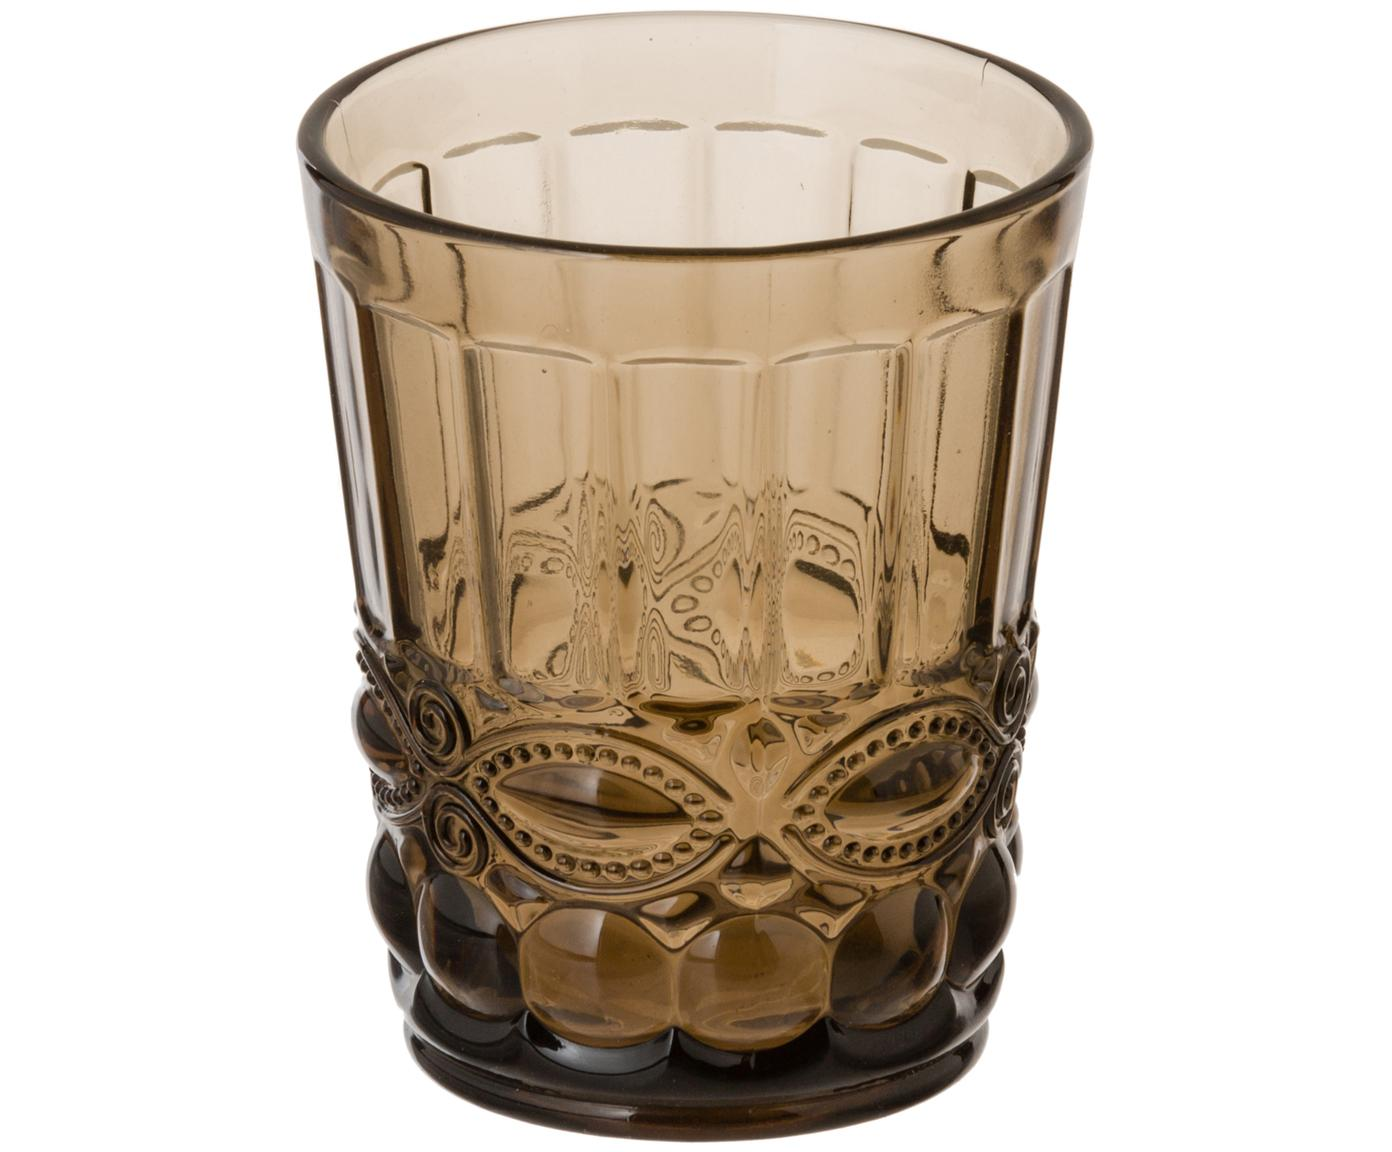 Komplet szklanek do wody Nobilis, 6 elem., Szkło, Wielobarwny, Ø 8 x W 10 cm